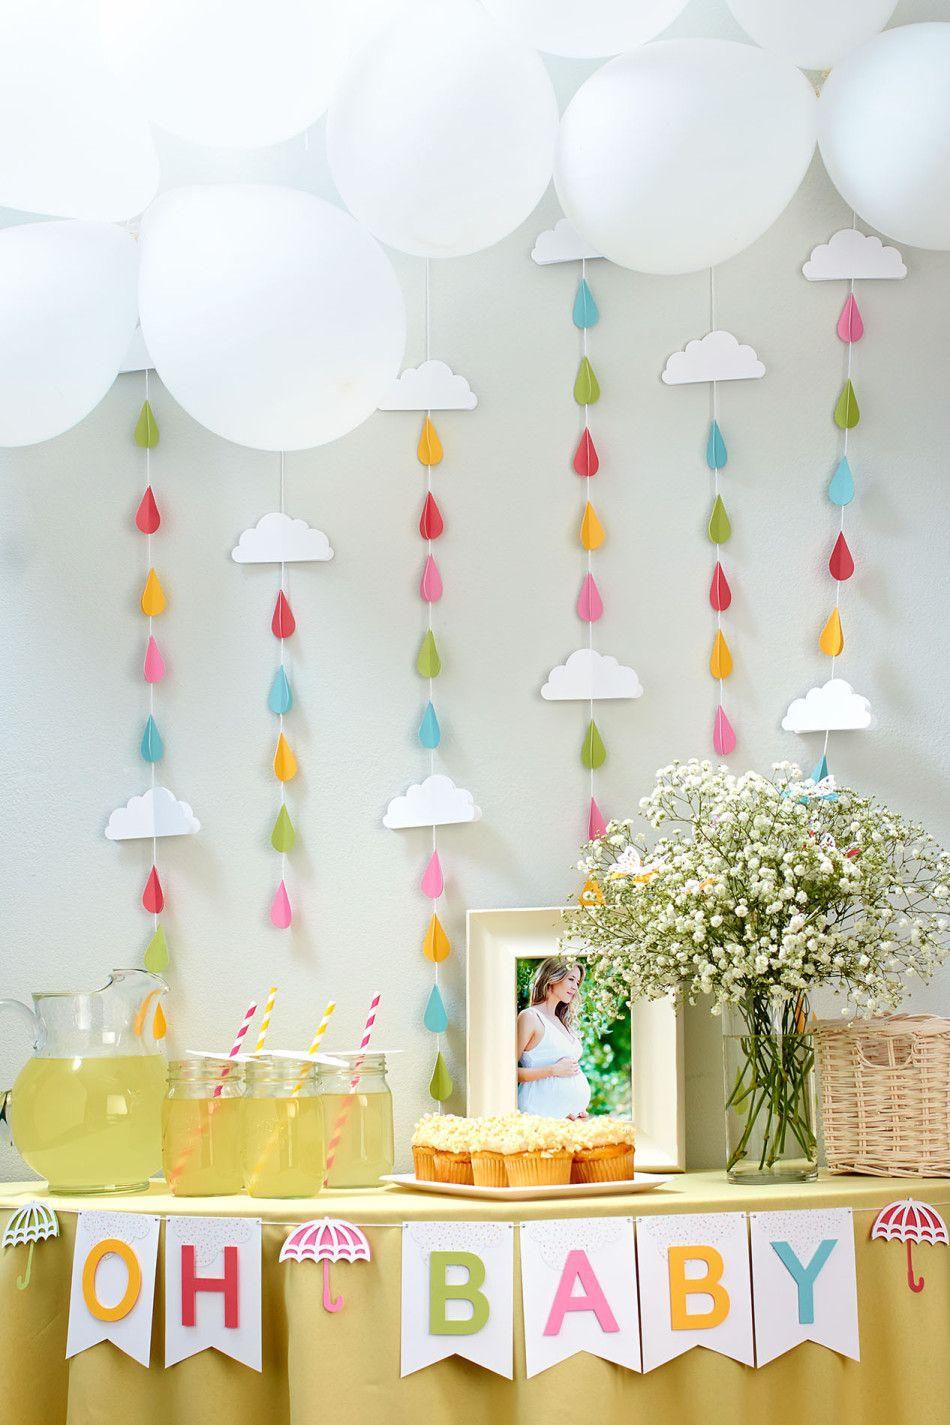 Throw A Shower Themed Baby Shower! #ctmh #cricut #closetomyheart  #babyshowerideas #showertheme #rain #clouds #springtime #babies #pregnancy